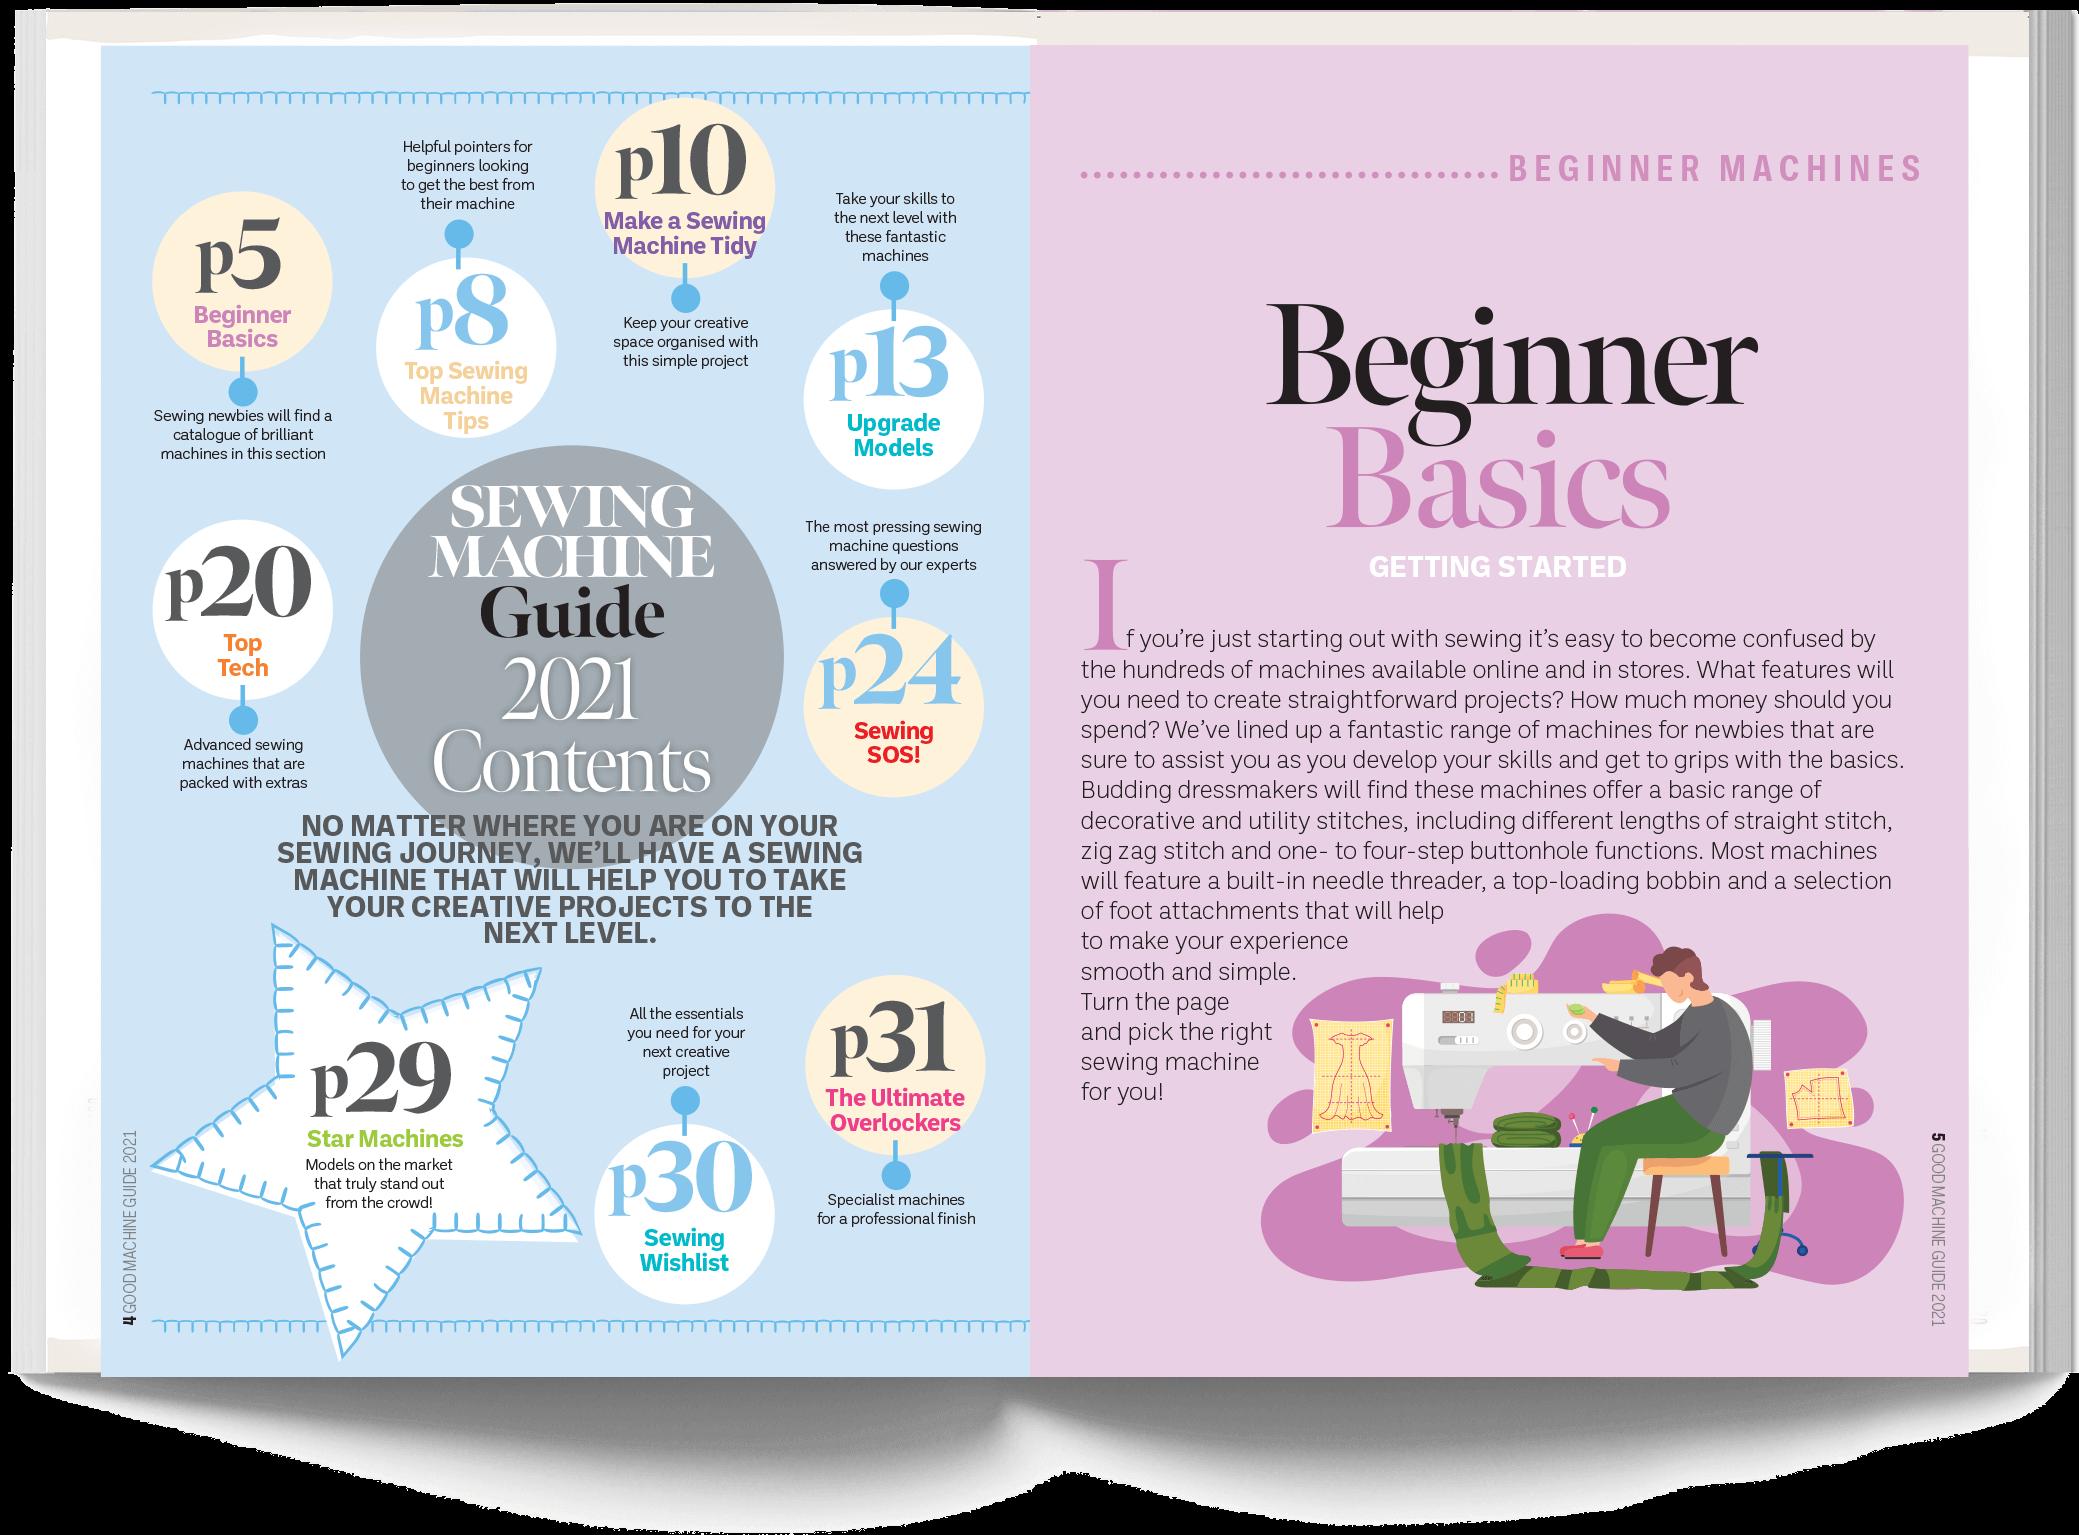 The Machine guide 2021 - Beginner Basics